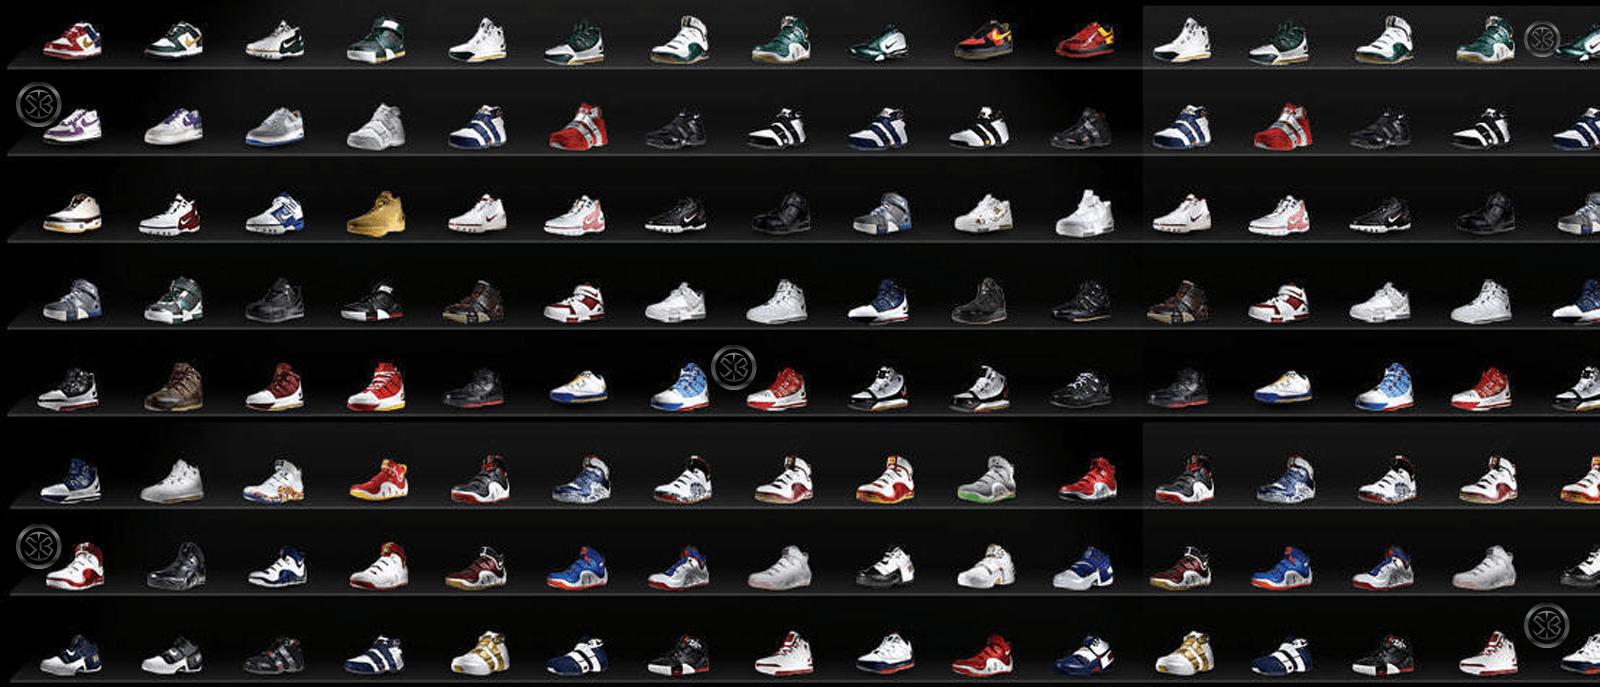 Sneaker Wall Wallpapers On Wallpaperdog